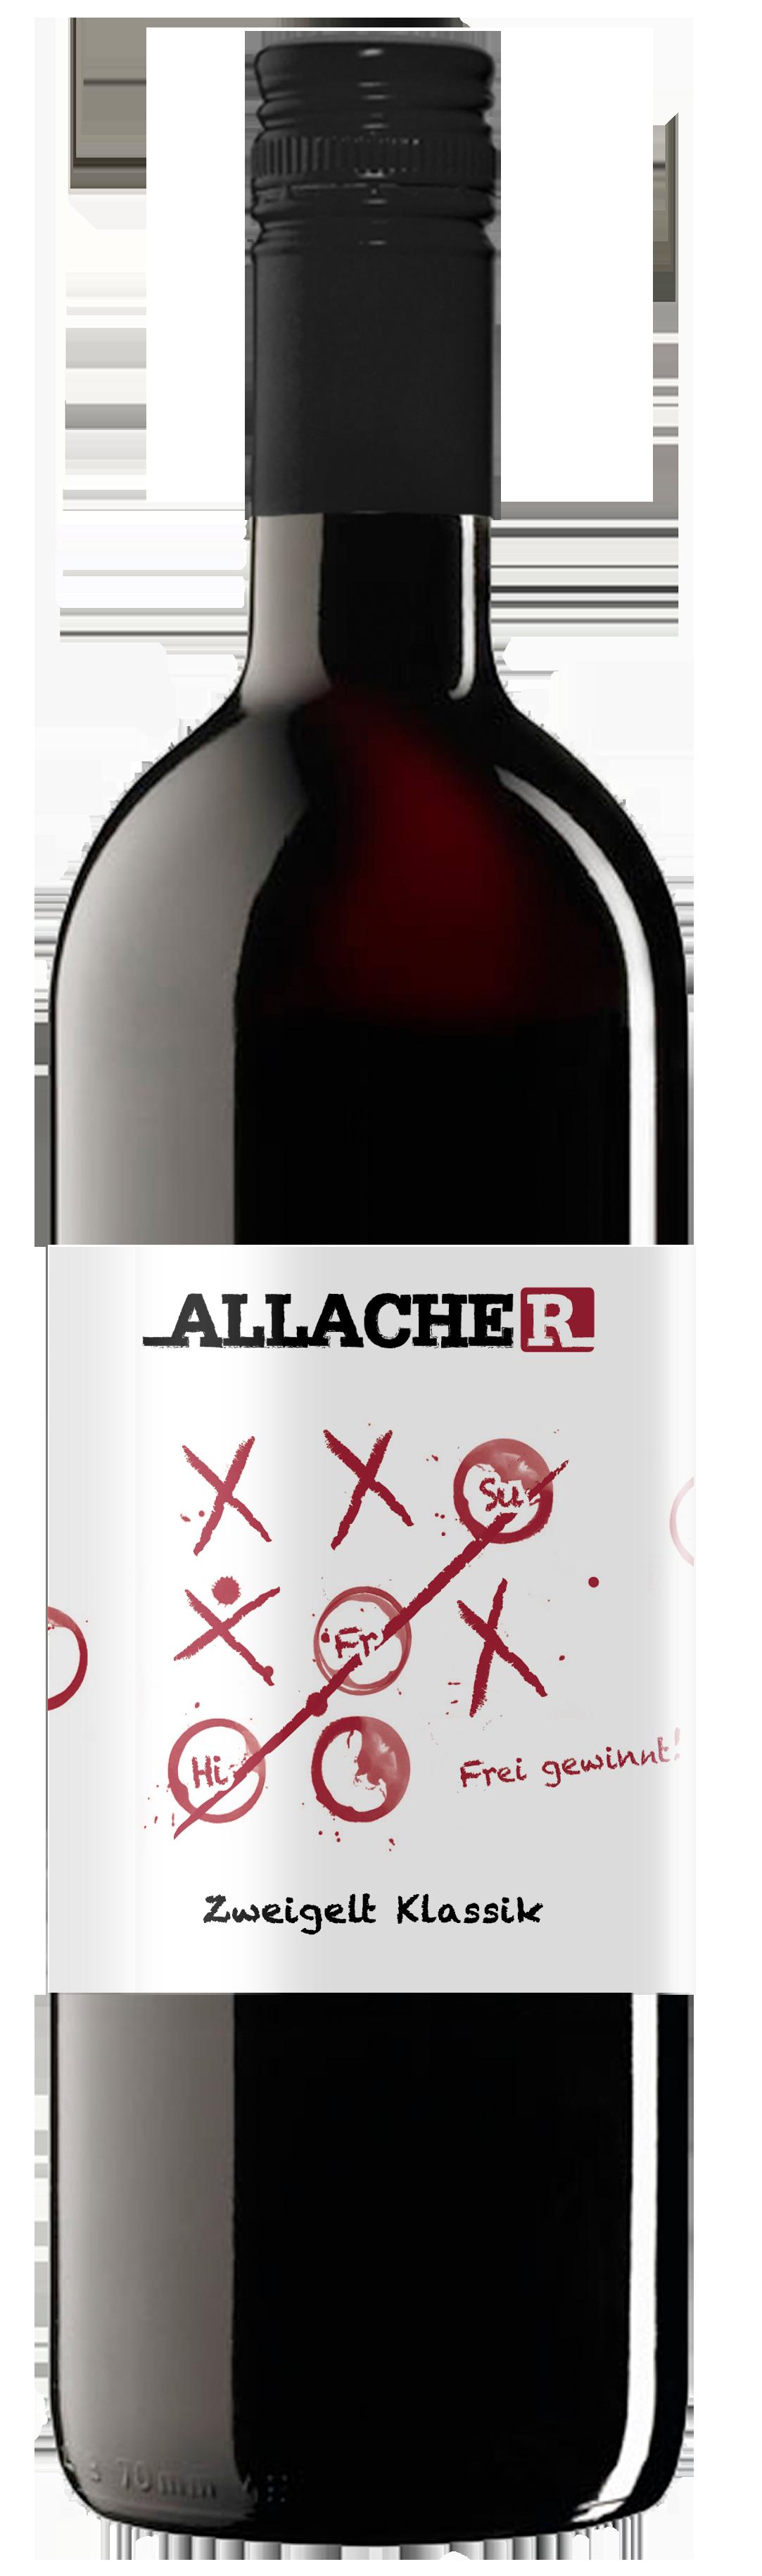 Allacher_ZW_klassik_3